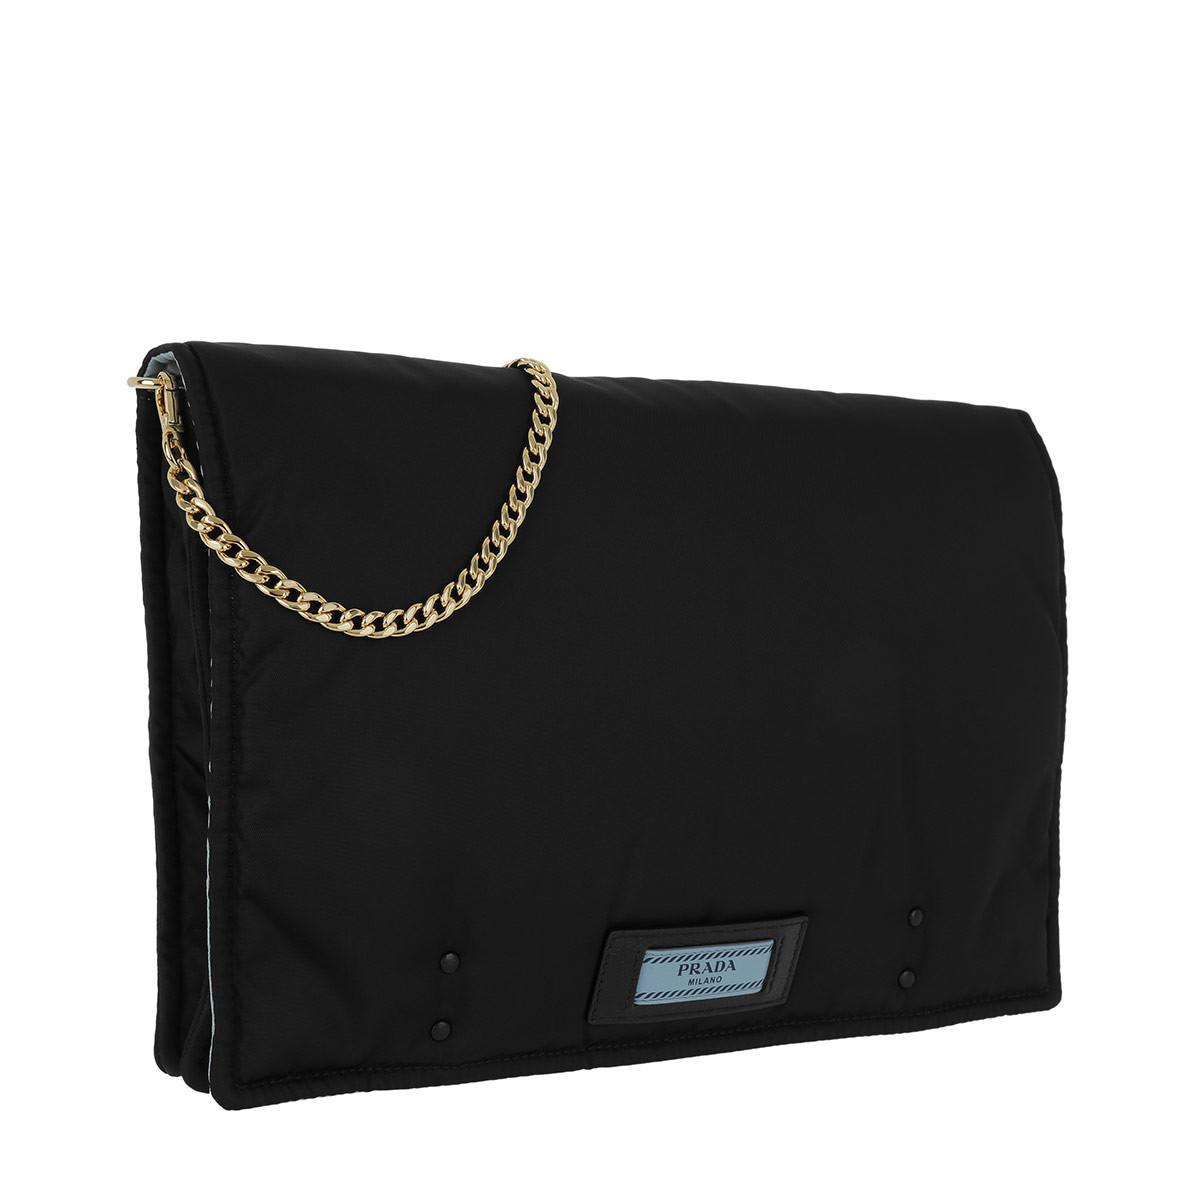 Pochette - Etiquette Pouch Nero/Astrale - blue, black - Pochette for ladies Prada